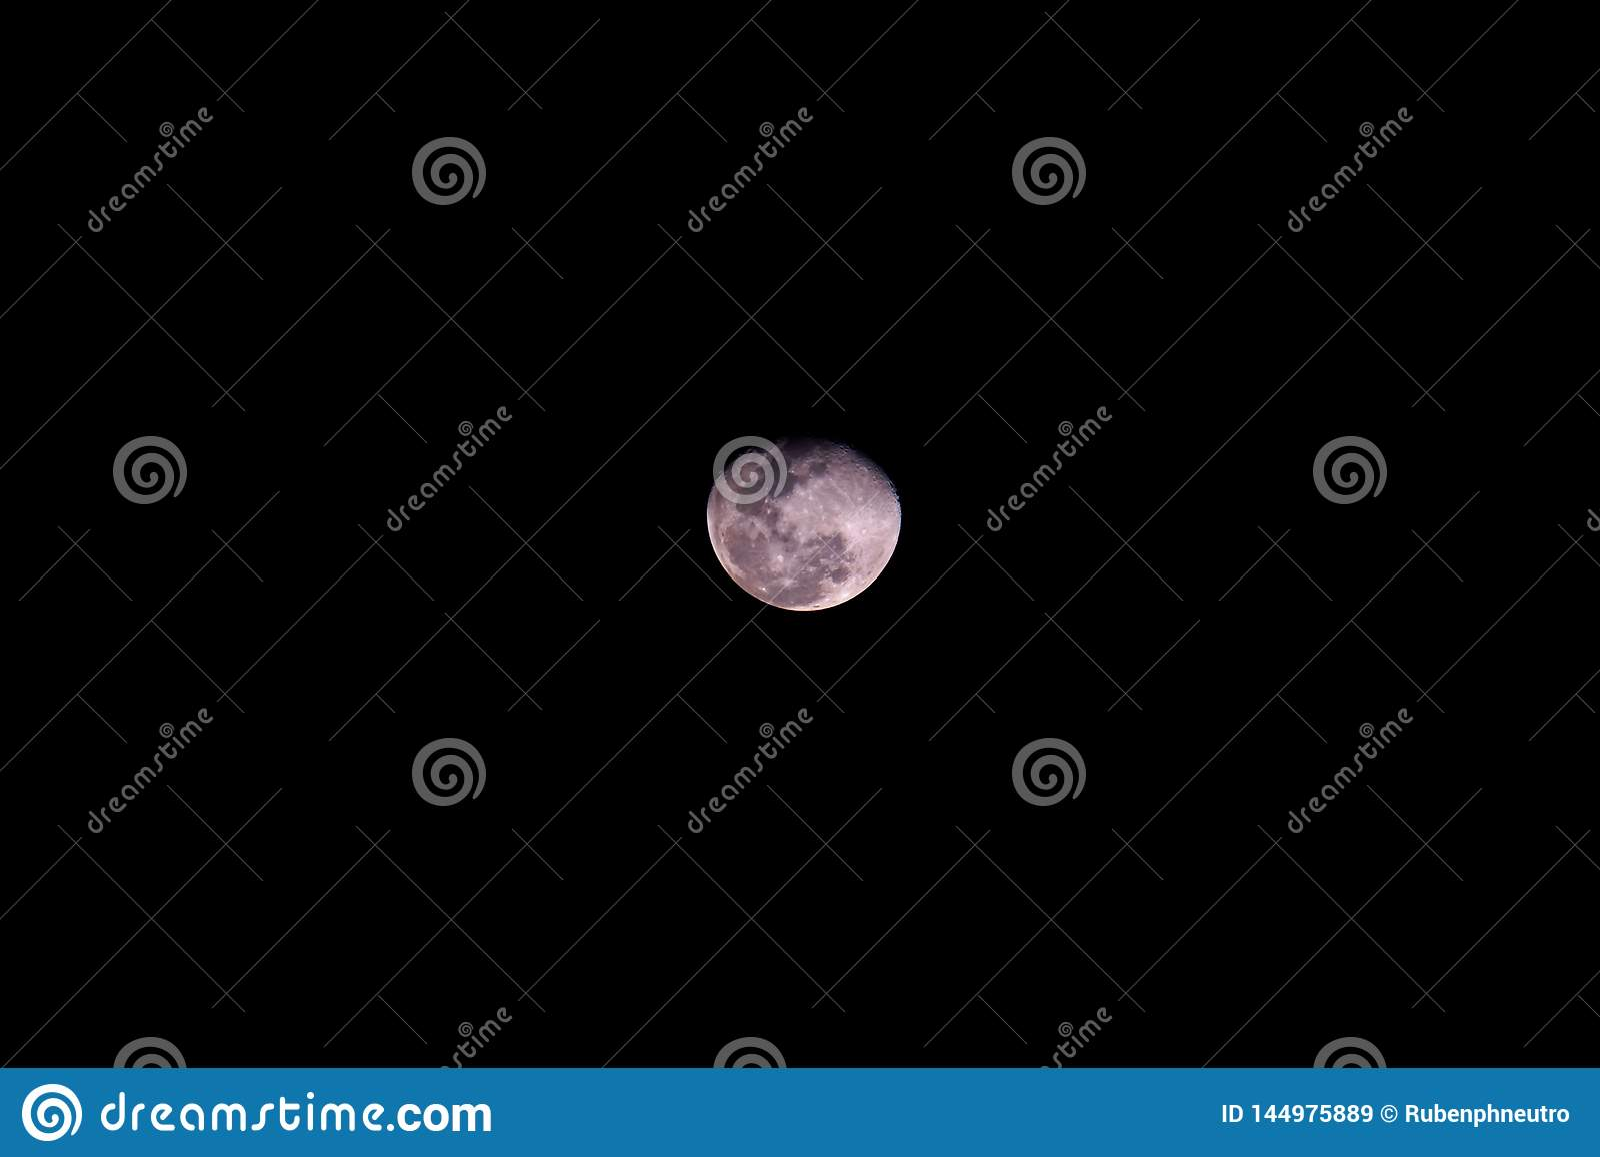 Full moon black background backdrop detail surface center moon pink moonlight